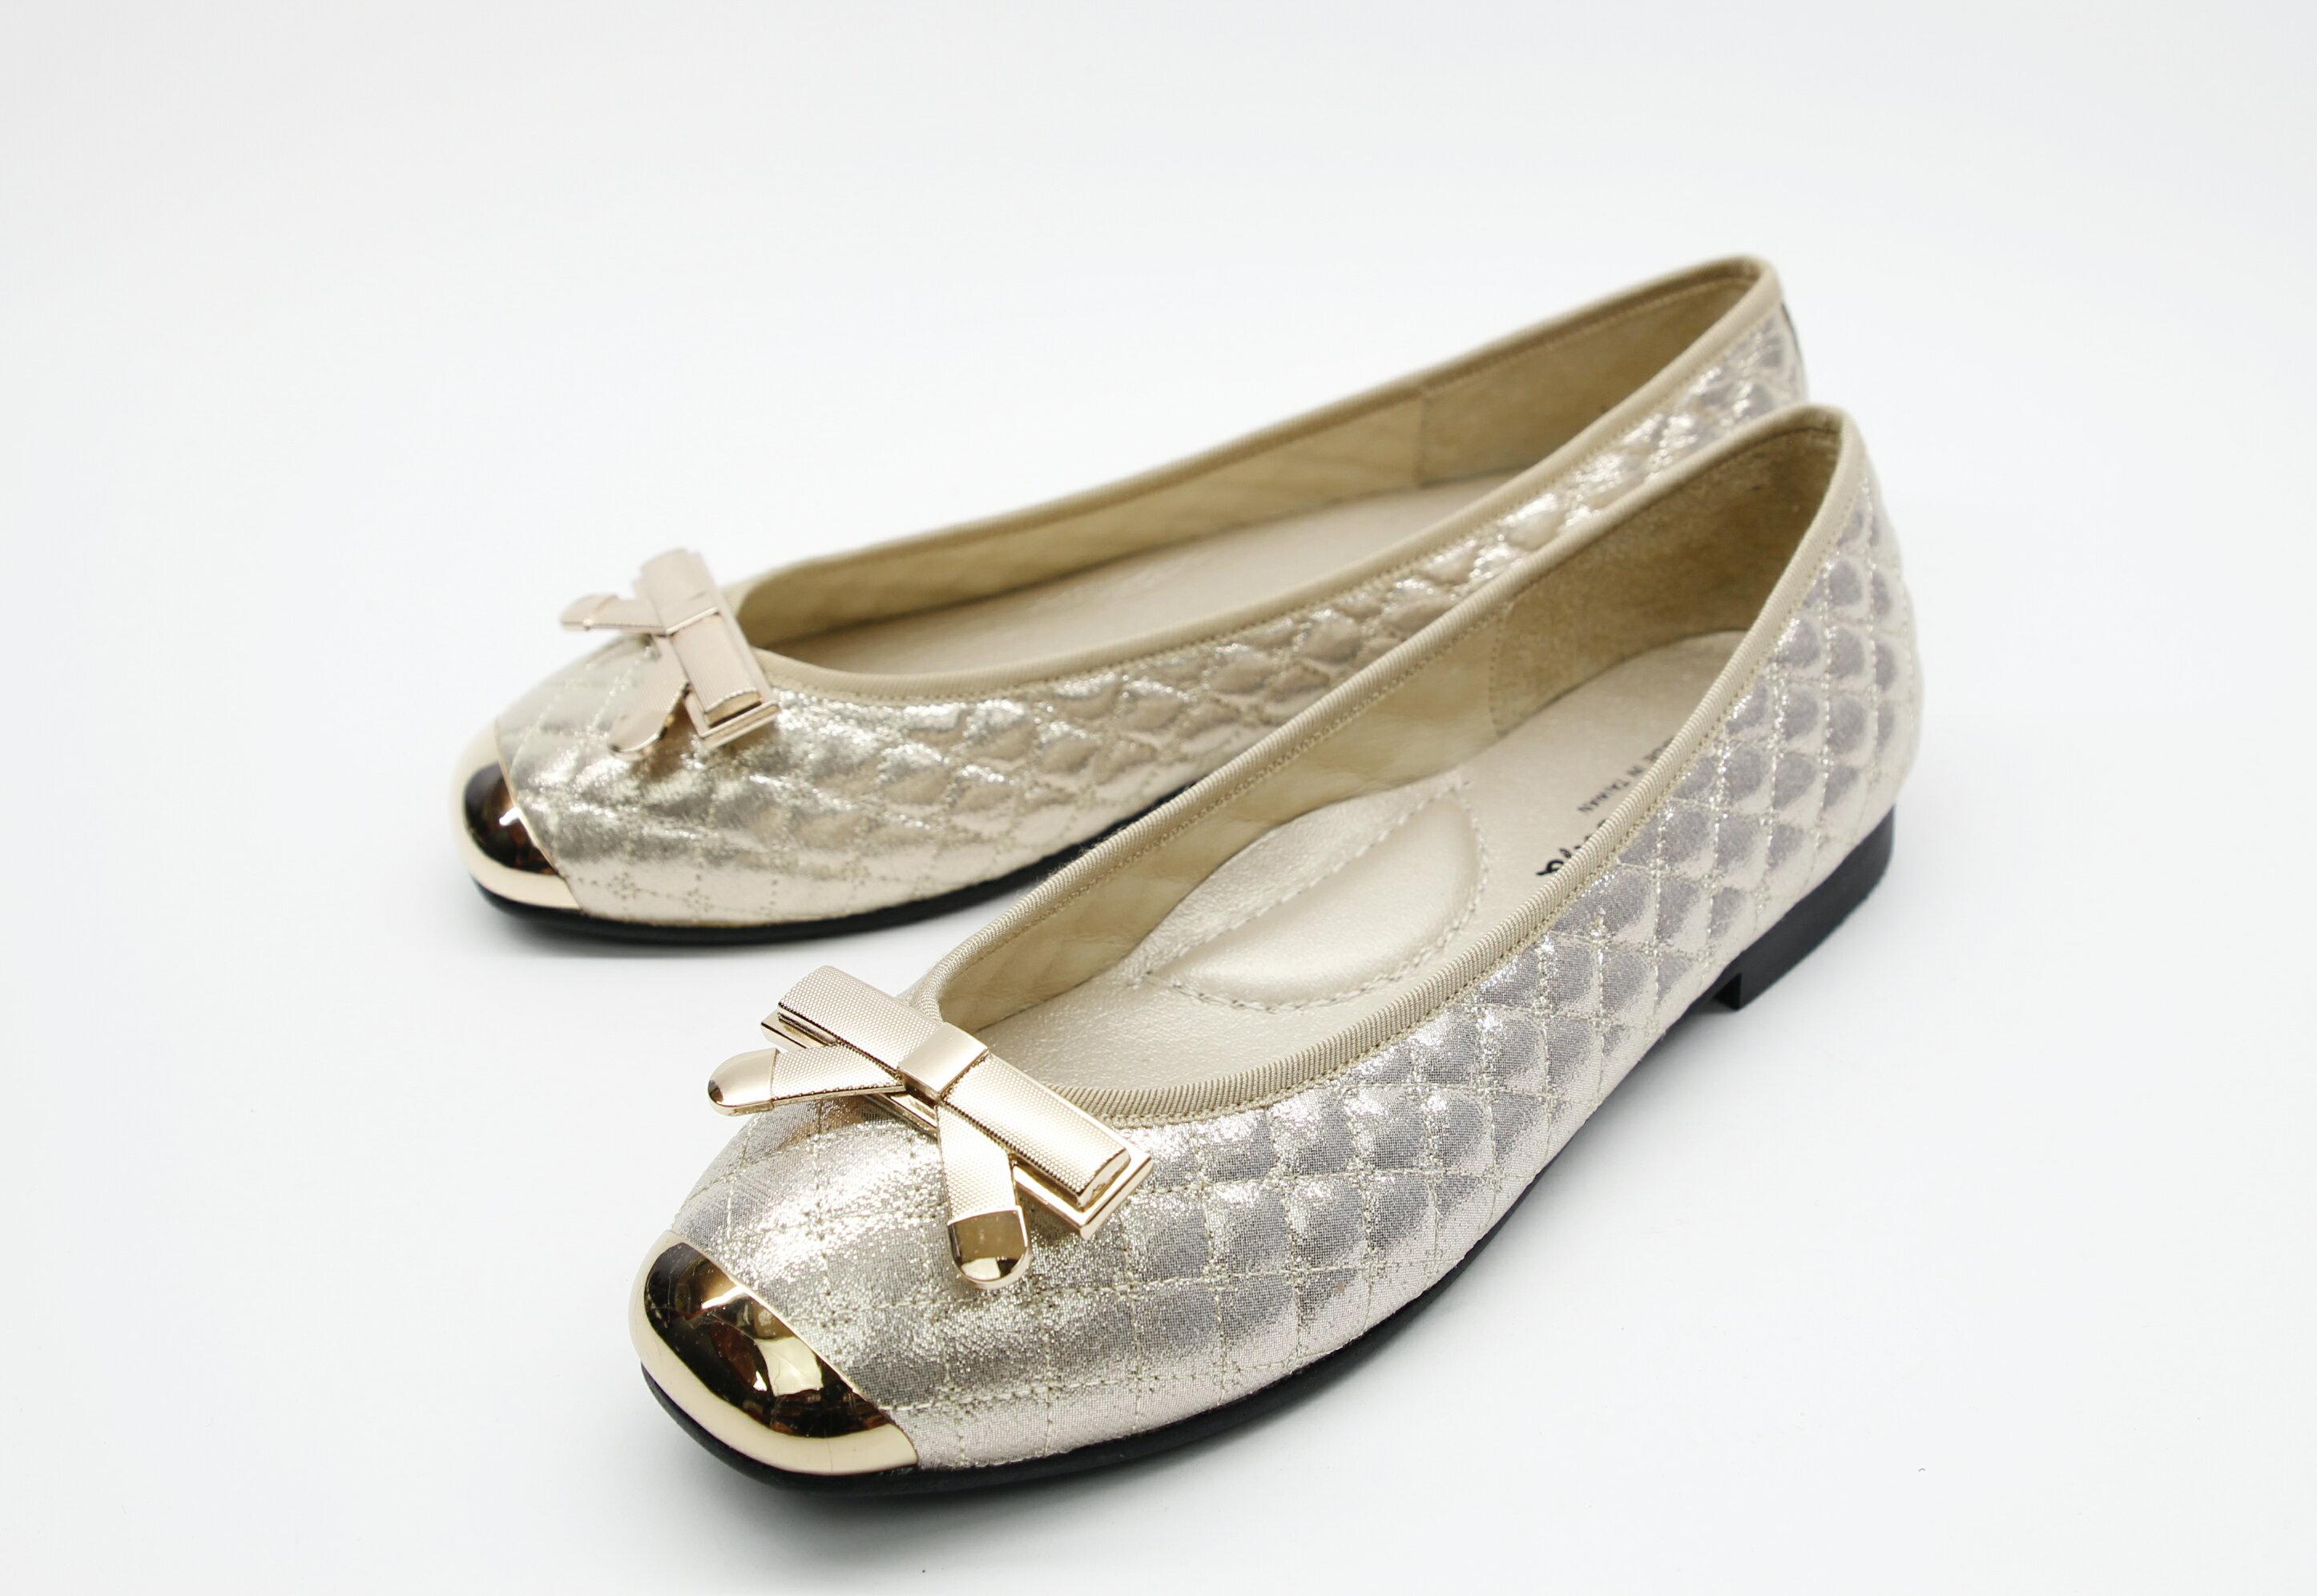 Aimez La Vie 經典優雅|經典款金屬蝴蝶結真皮菱格紋平底娃娃鞋